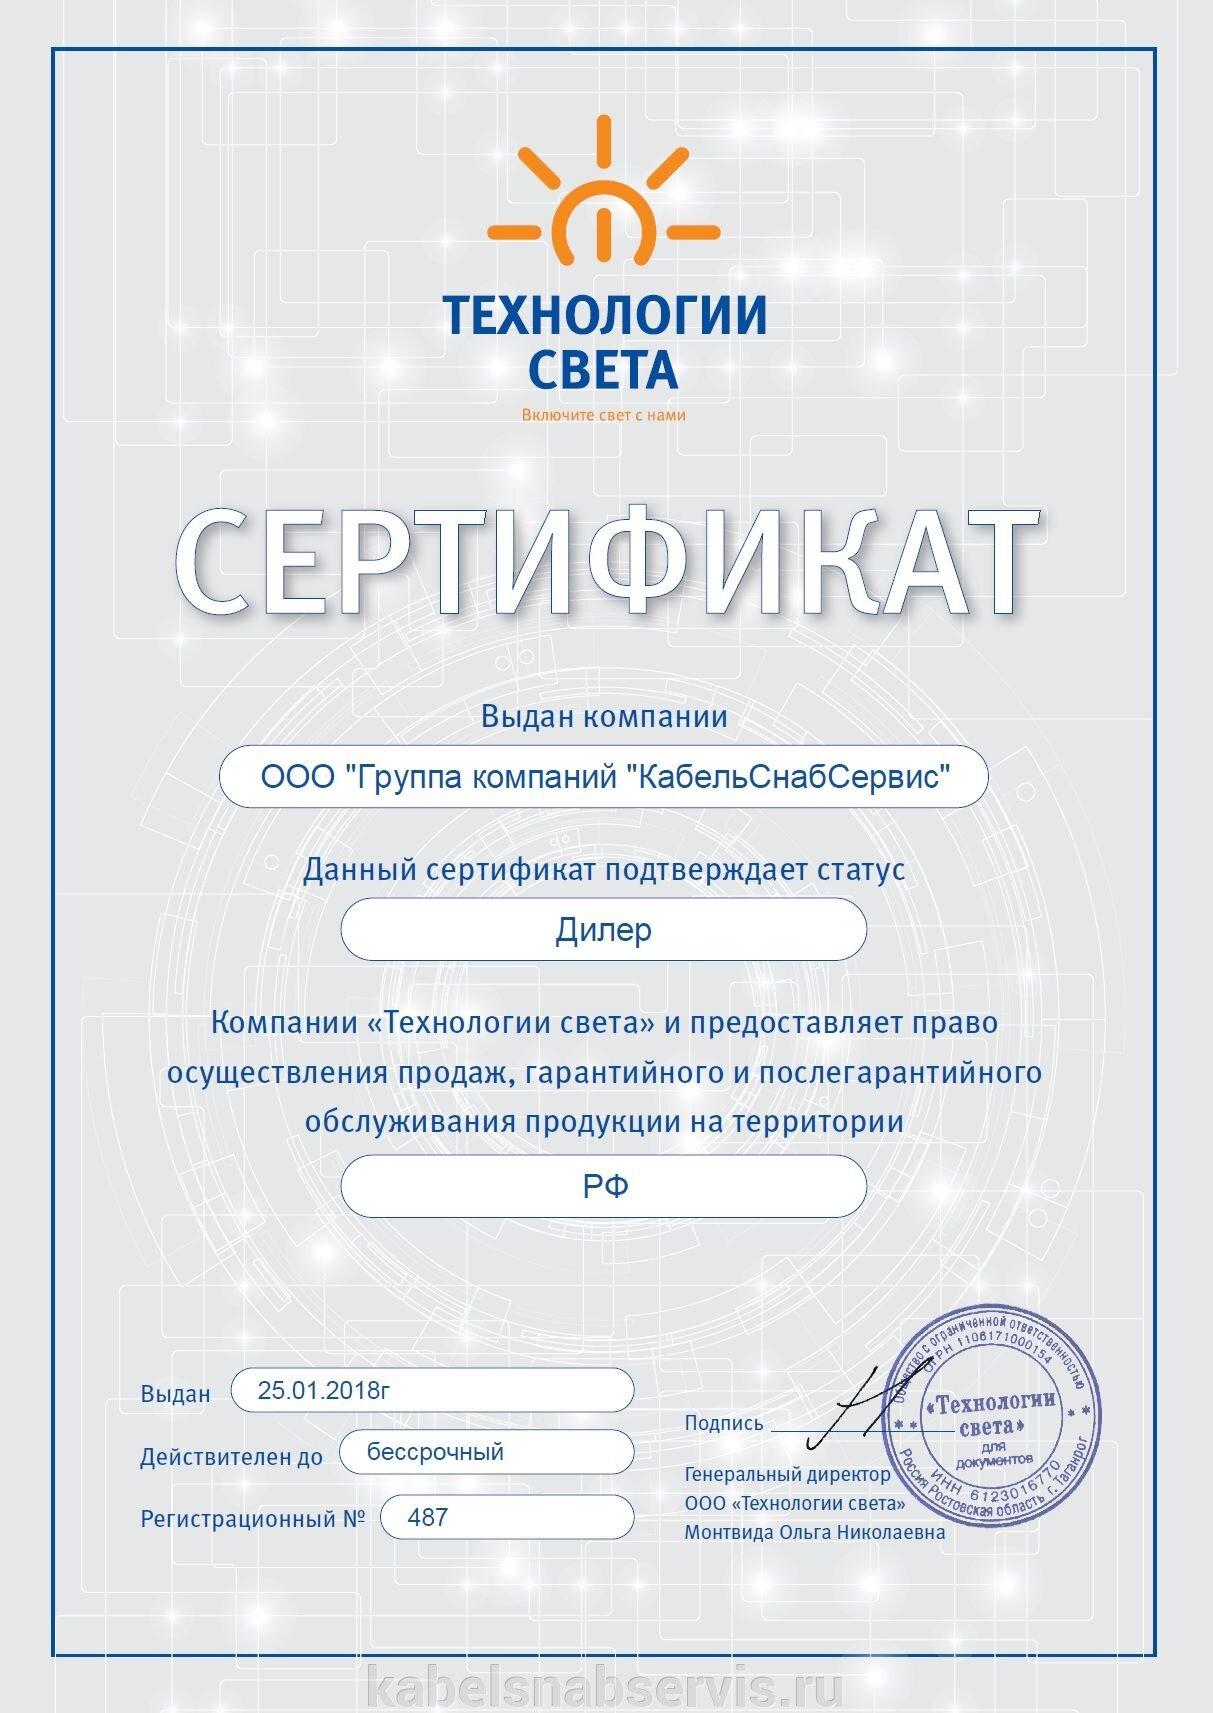 Сертификаты компании - фото pic_9836df4e7b14e95_1920x9000_1.jpg